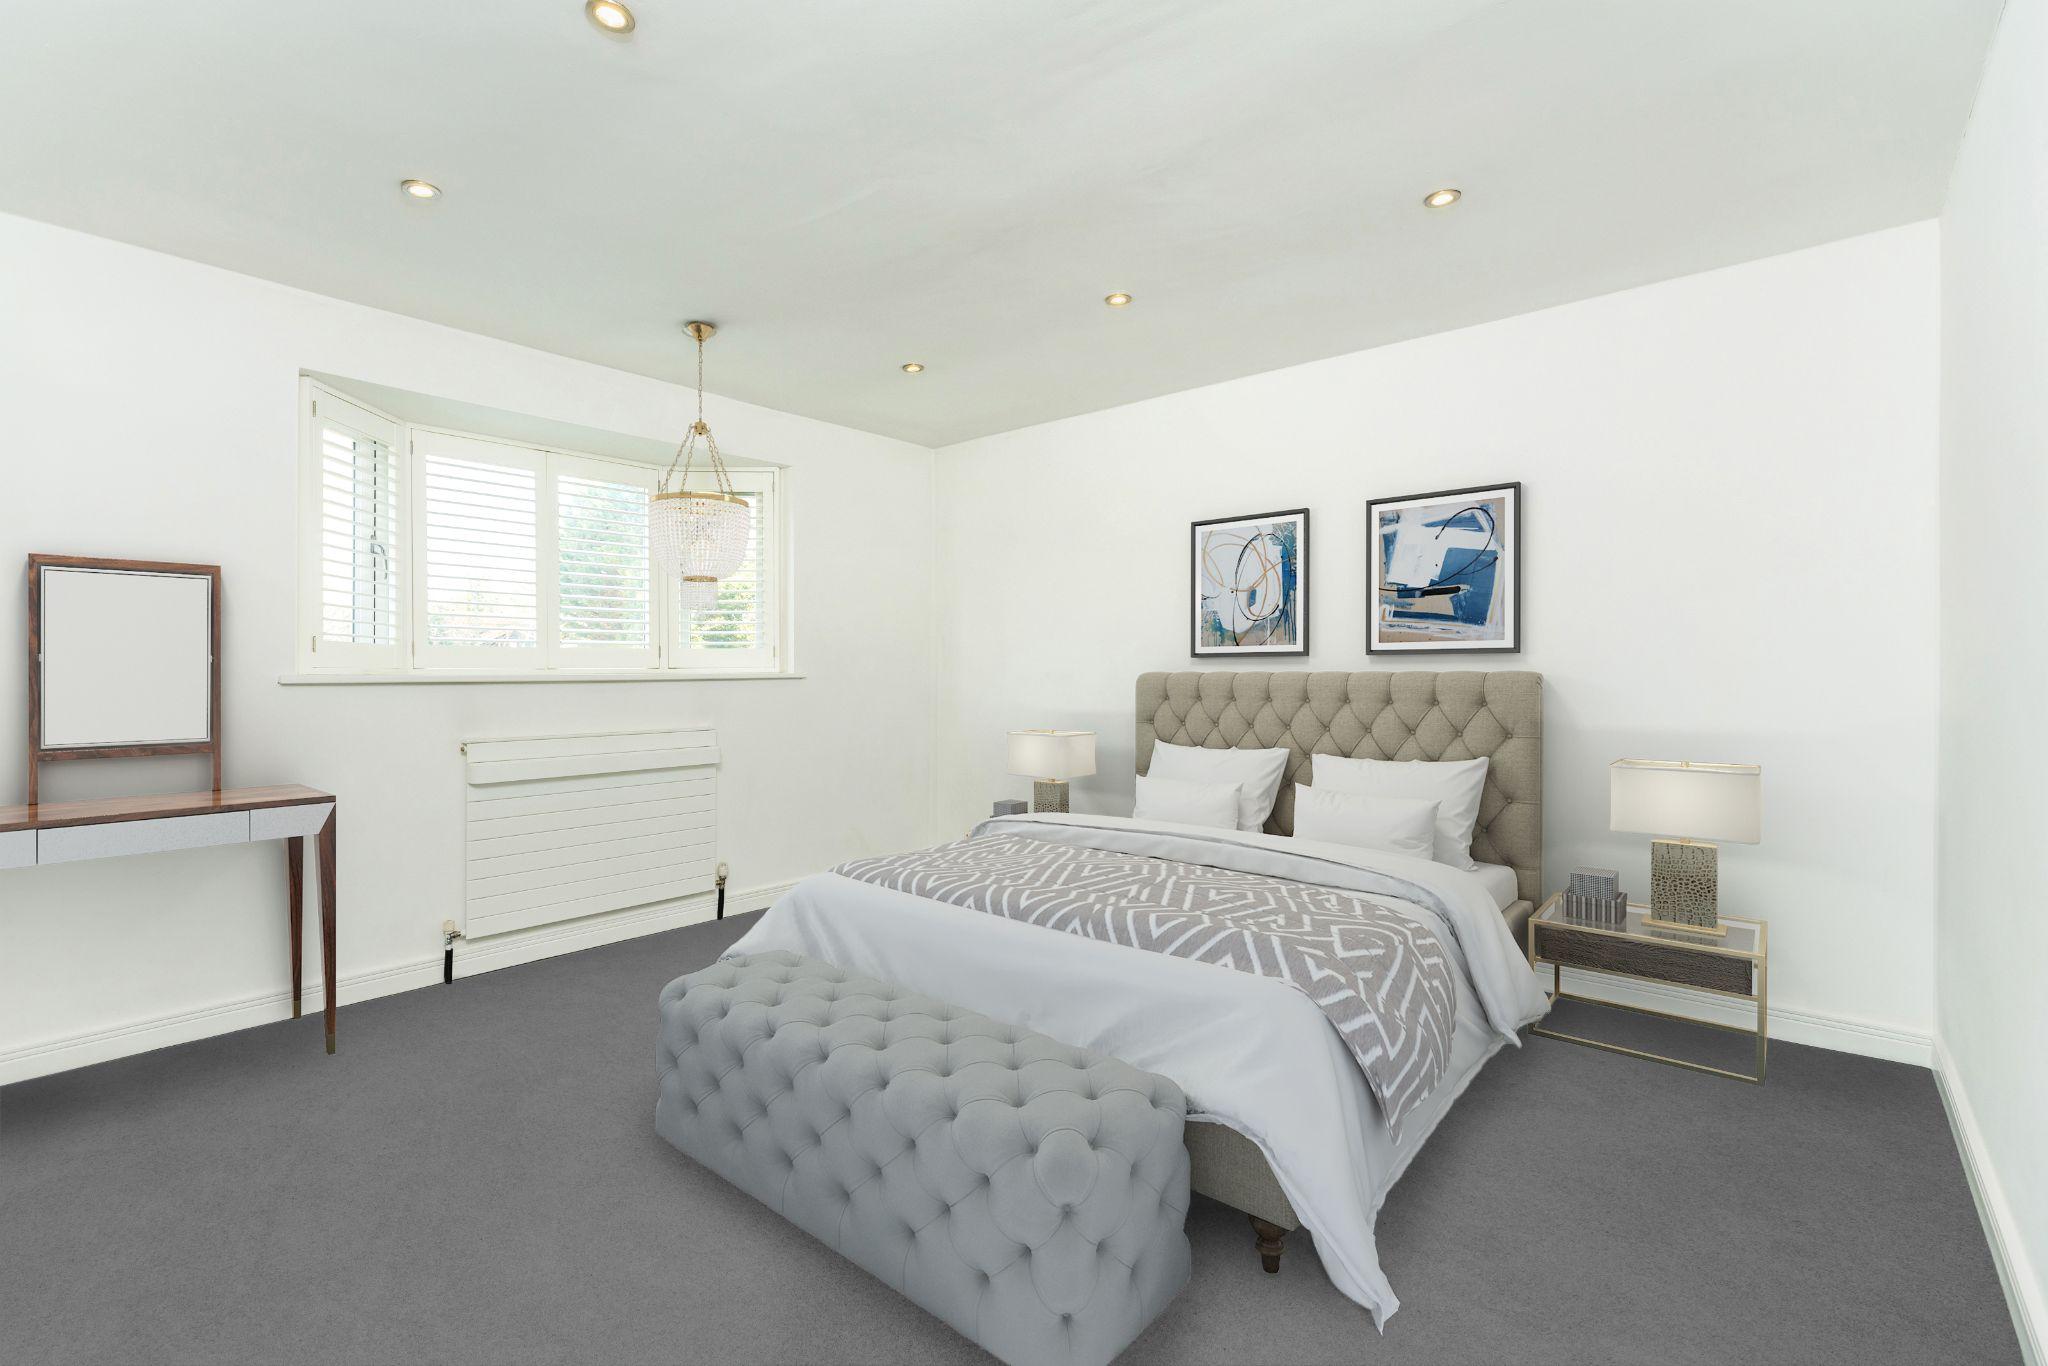 5 Bedroom Detached House For Sale - Bedroom 2